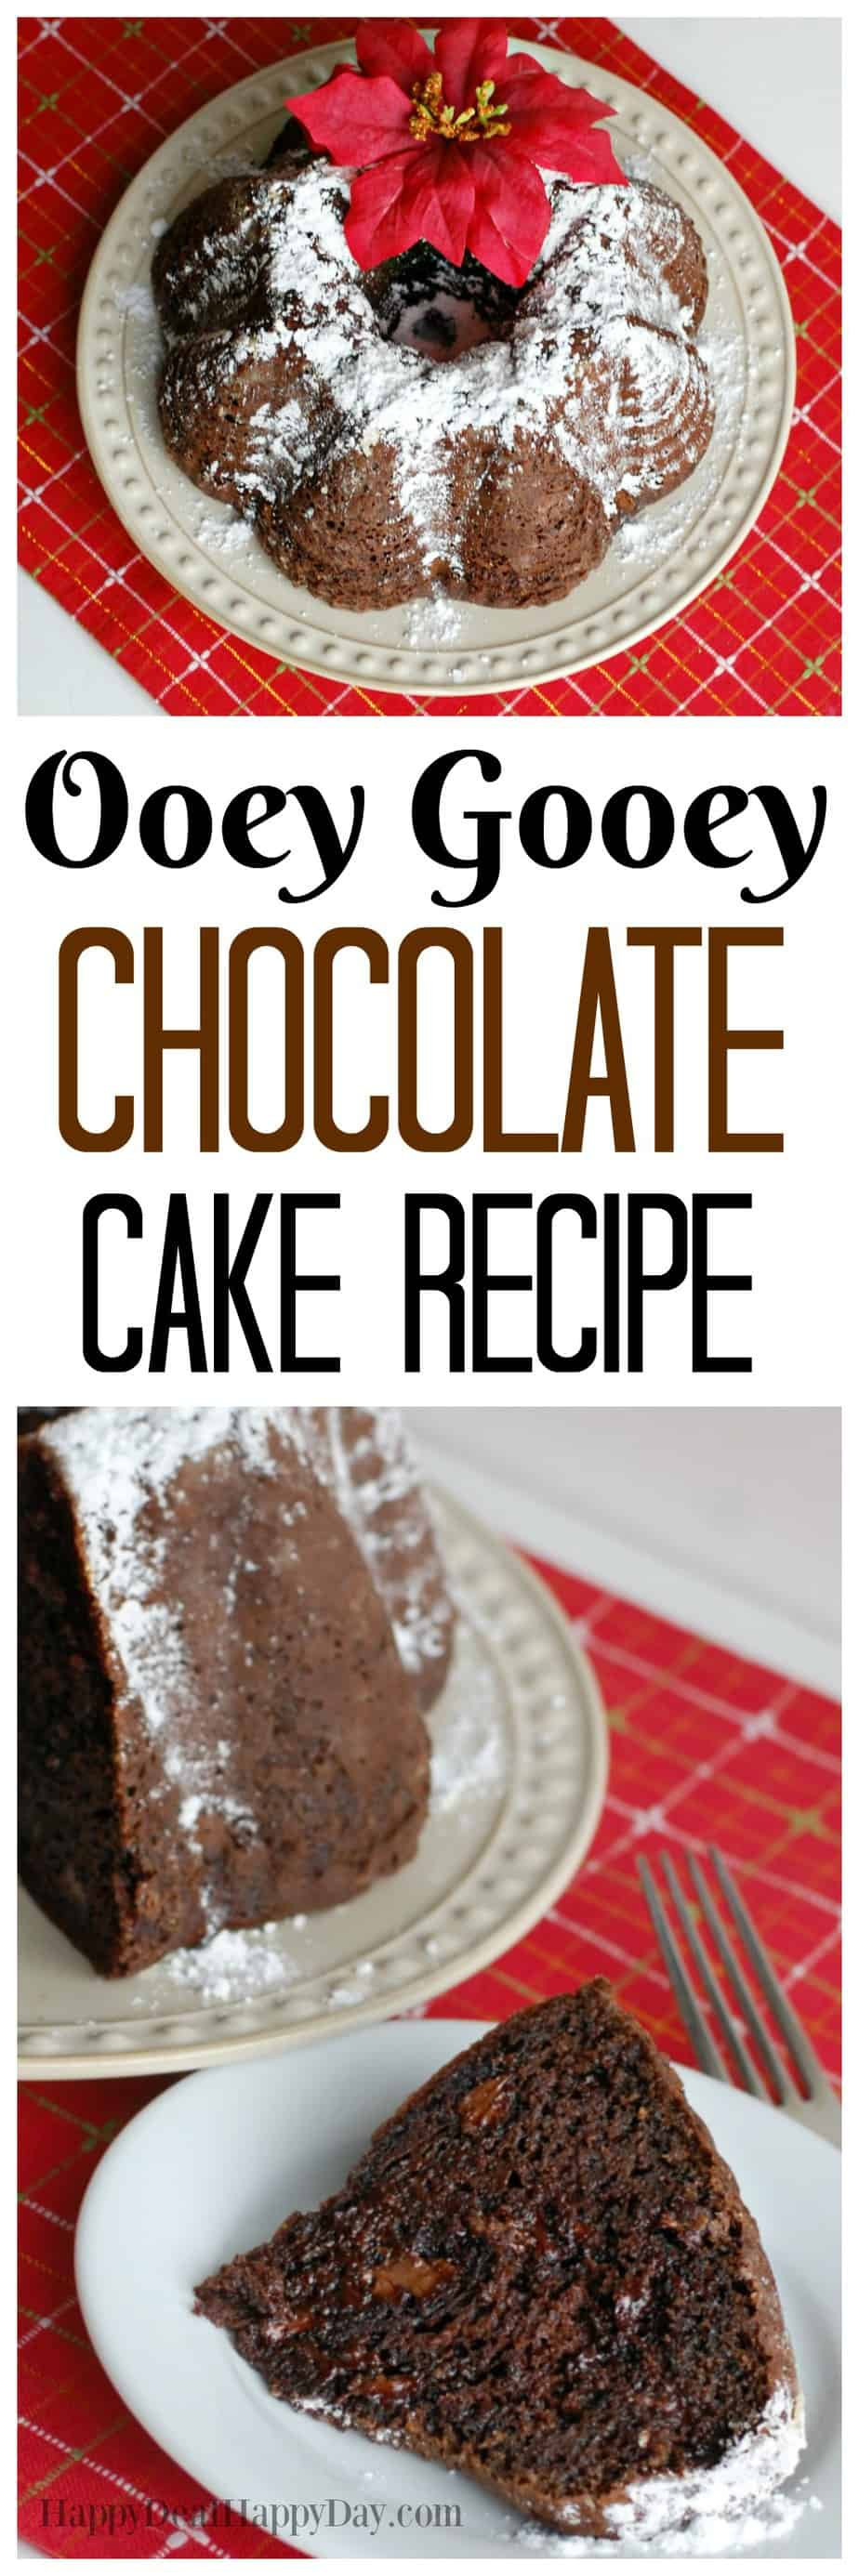 Ooey Gooey Chocolate Cake Recipe   Happy Deal - Happy Day!